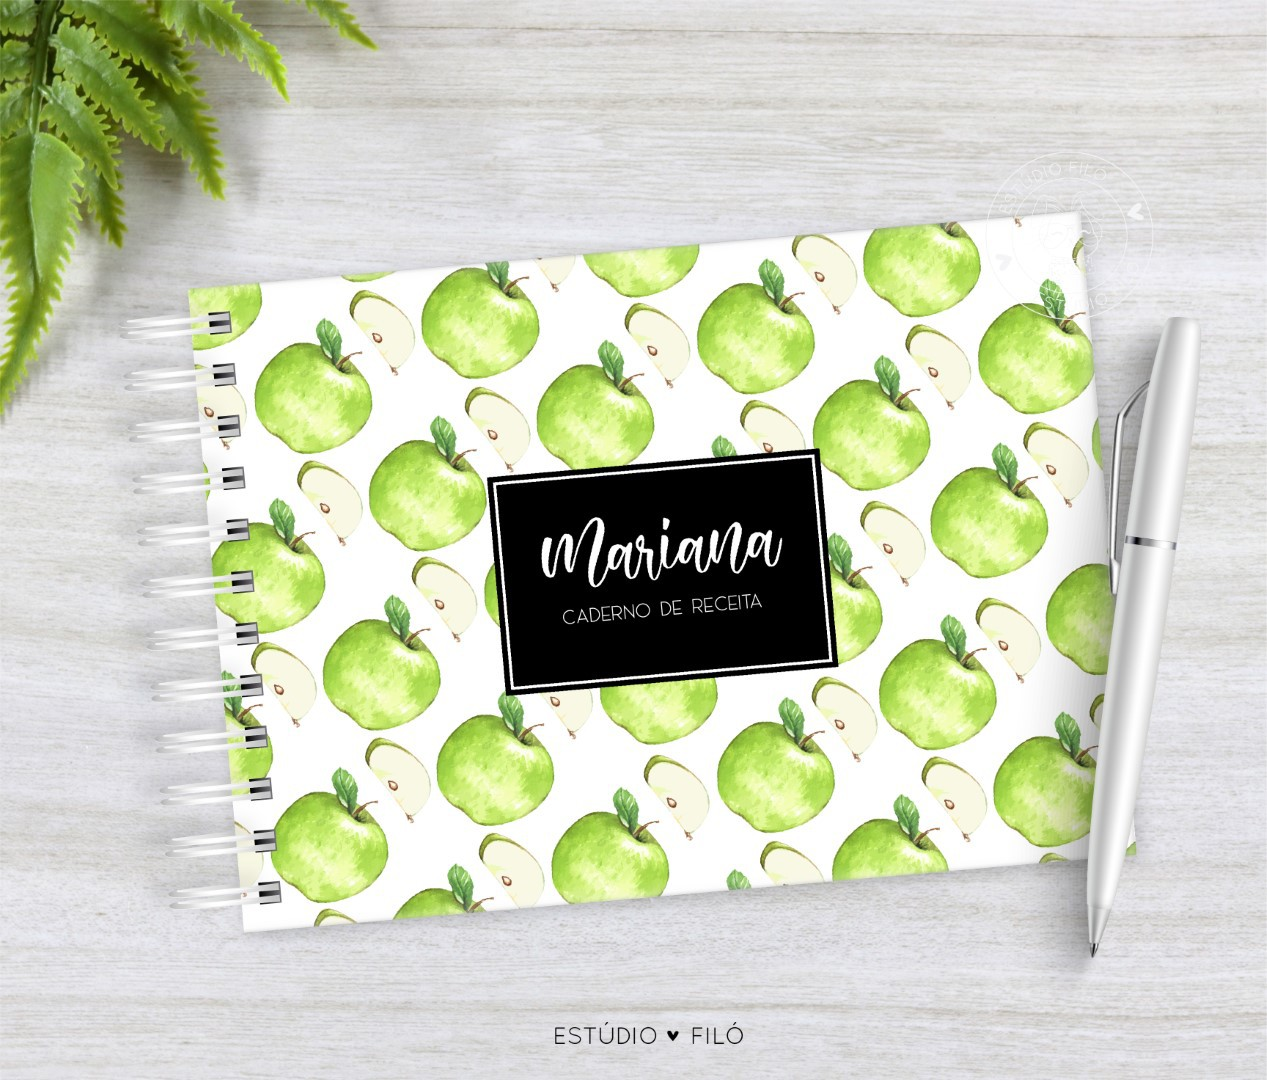 Caderno de receitas maça verde